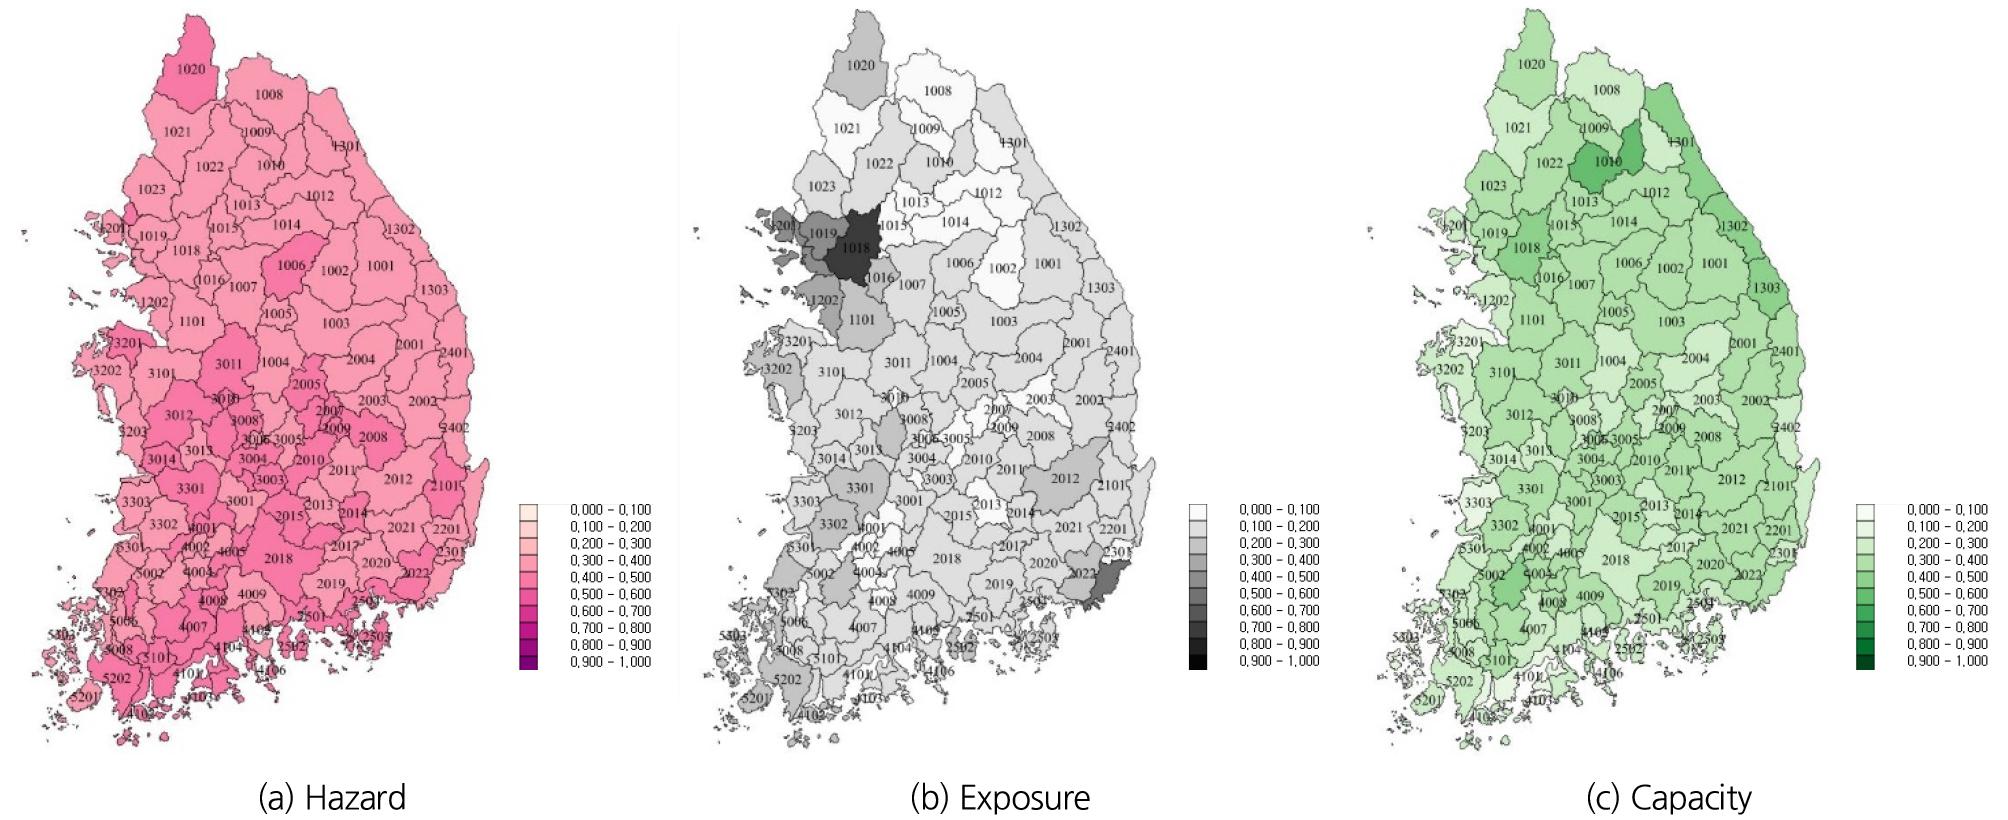 http://static.apub.kr/journalsite/sites/kwra/2020-053-05/N0200530501/images/kwra_53_05_01_F3.jpg